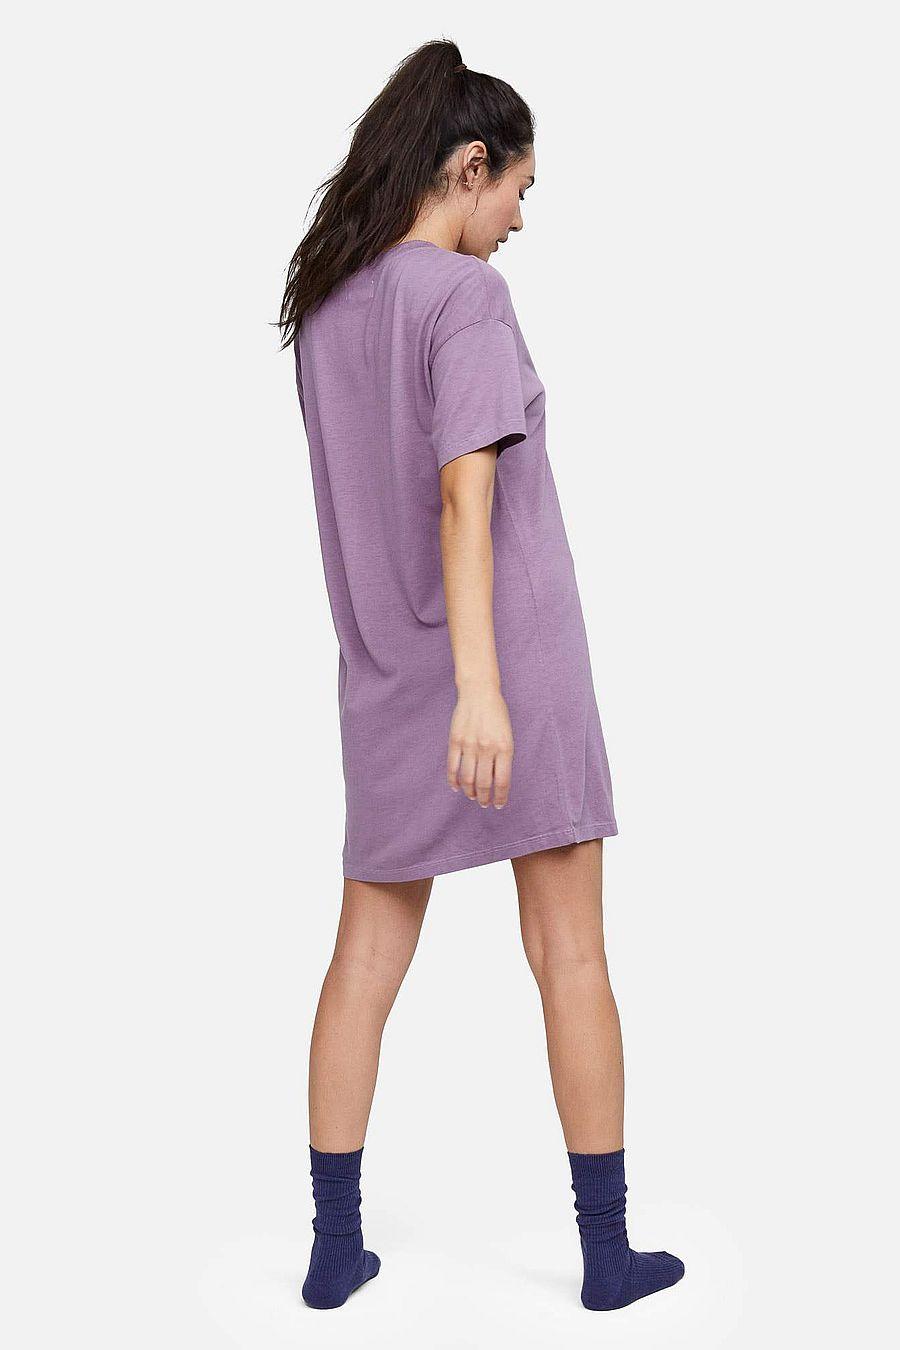 MATE The Label Tencel Sleep Tee Dress - LAVENDER